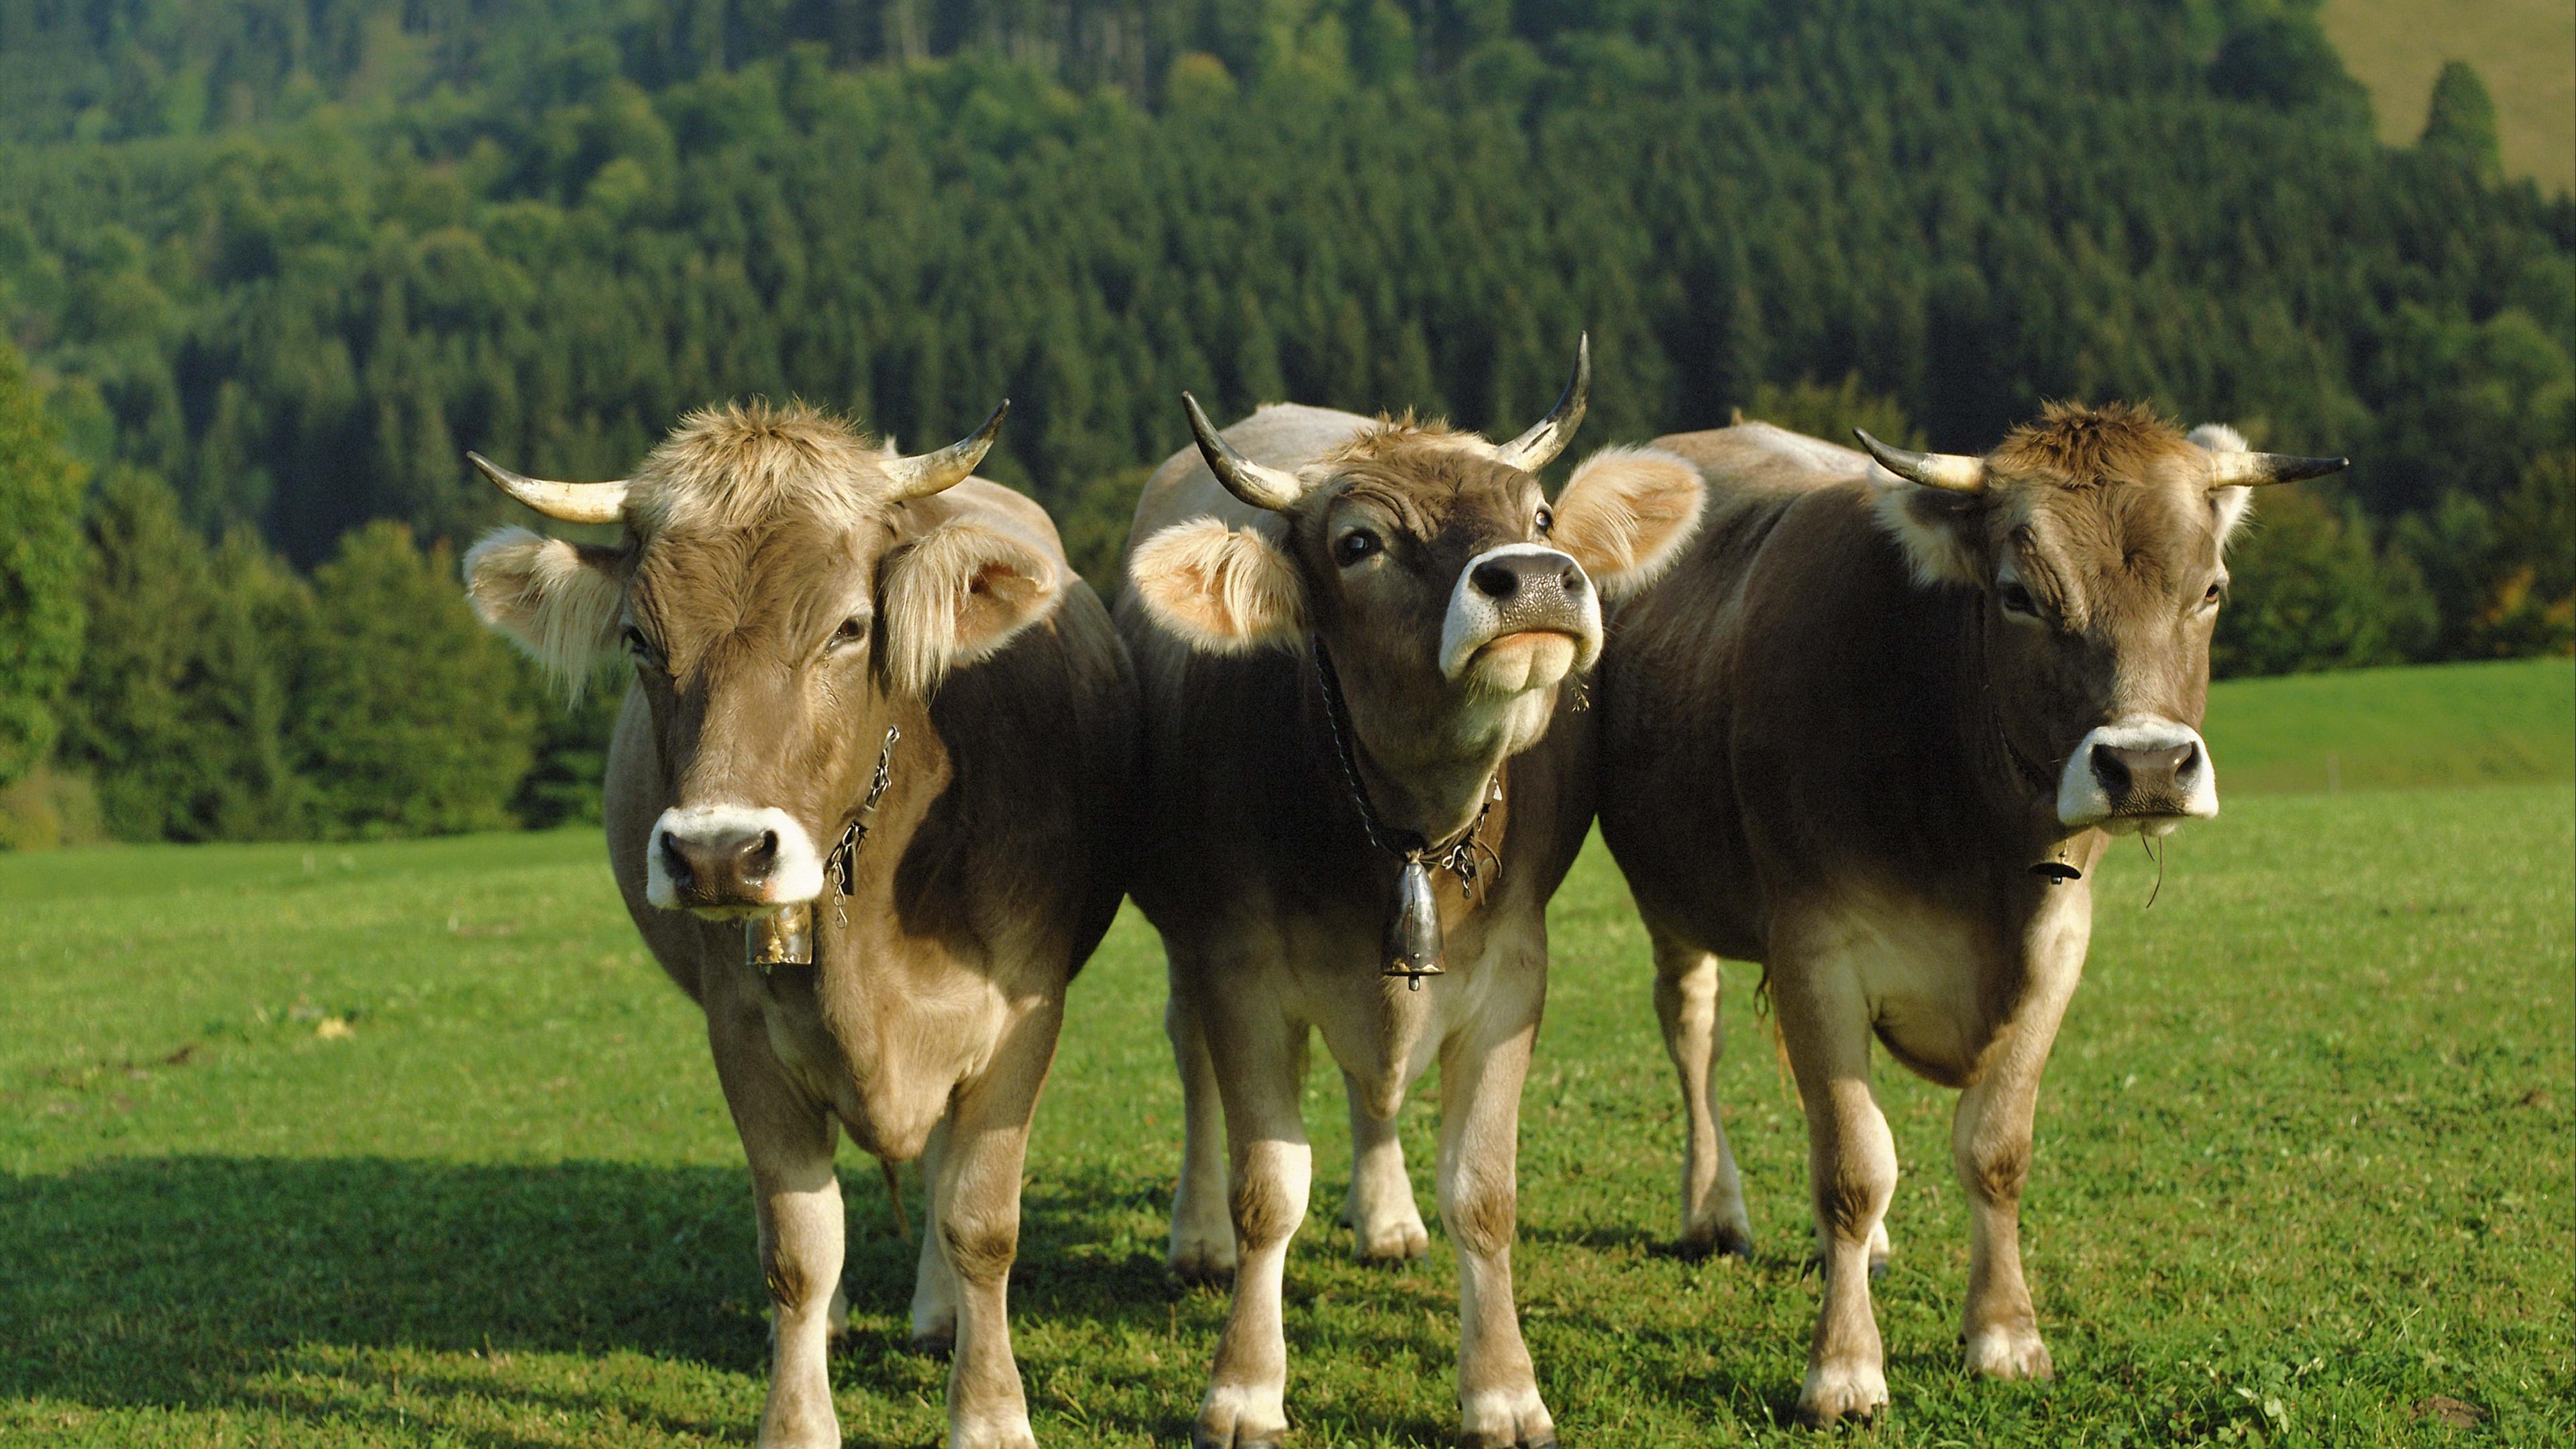 cows three bells lawn 4k 1542242118 - cows, three, bells, lawn 4k - Three, cows, bells